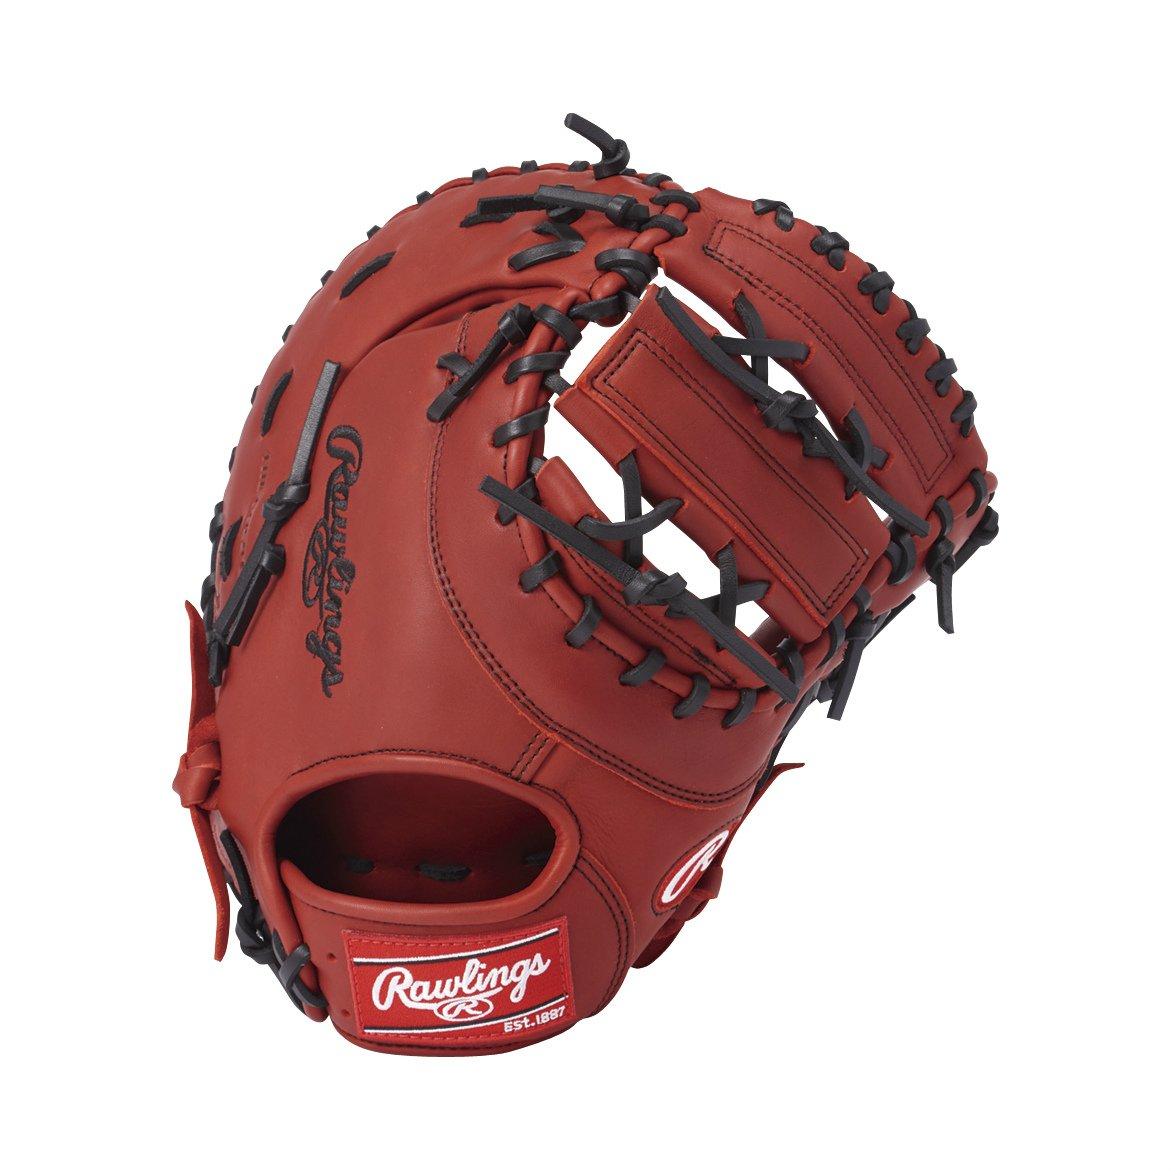 Rawlings(ローリングス) ソフトボール用 ソフト HYPER TECH DP[ファースト用] GS8HT3ACD B075Z56L2X [サイズ 12.5] [12 1/2inch] LH(Right hand throw)※右投用 レッド レッド [サイズ 12.5] [12 1/2inch] LH(Right hand throw)※右投用